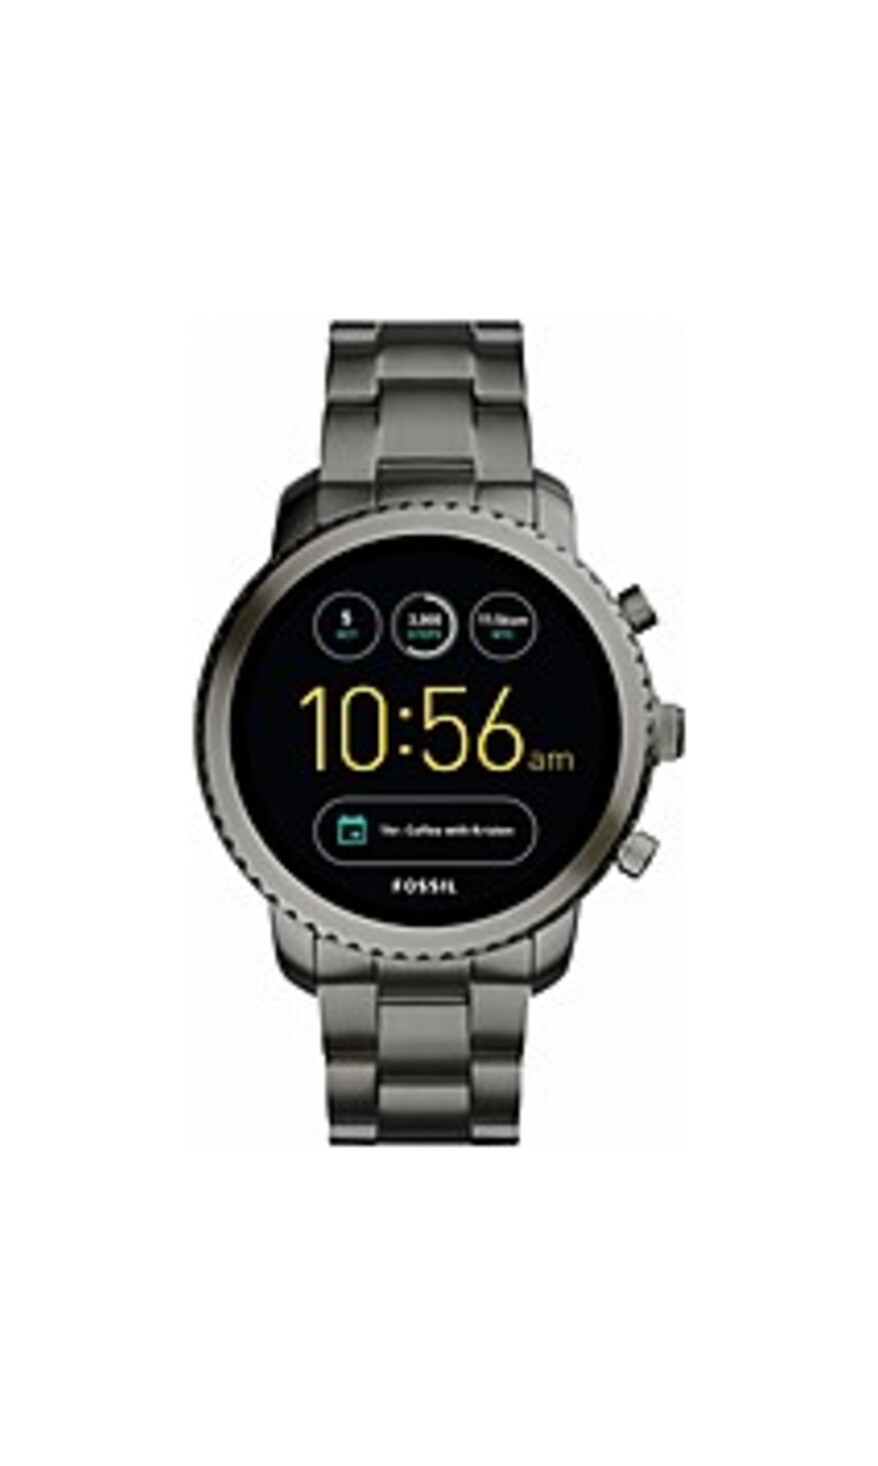 Fossil FTW4001 Q Explorist Generation 3 Smartwatch - 1.8-Inch Case Diameter - Smoke Stainless Steel